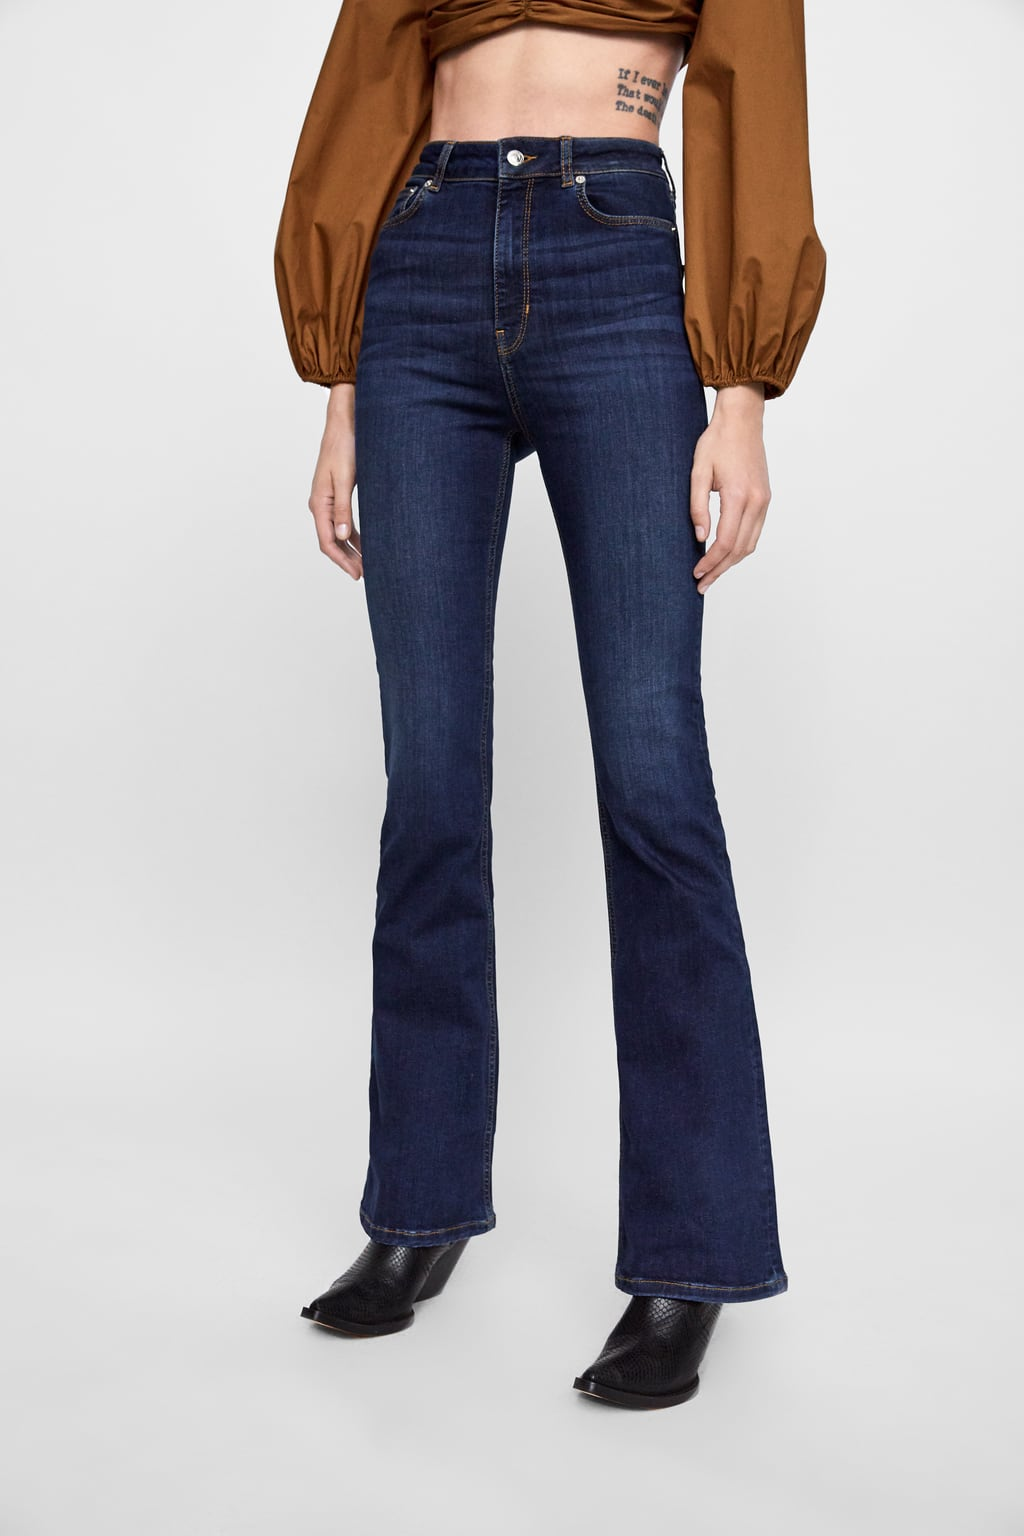 zara, high rise jeans, flare jeans, dark washed denim